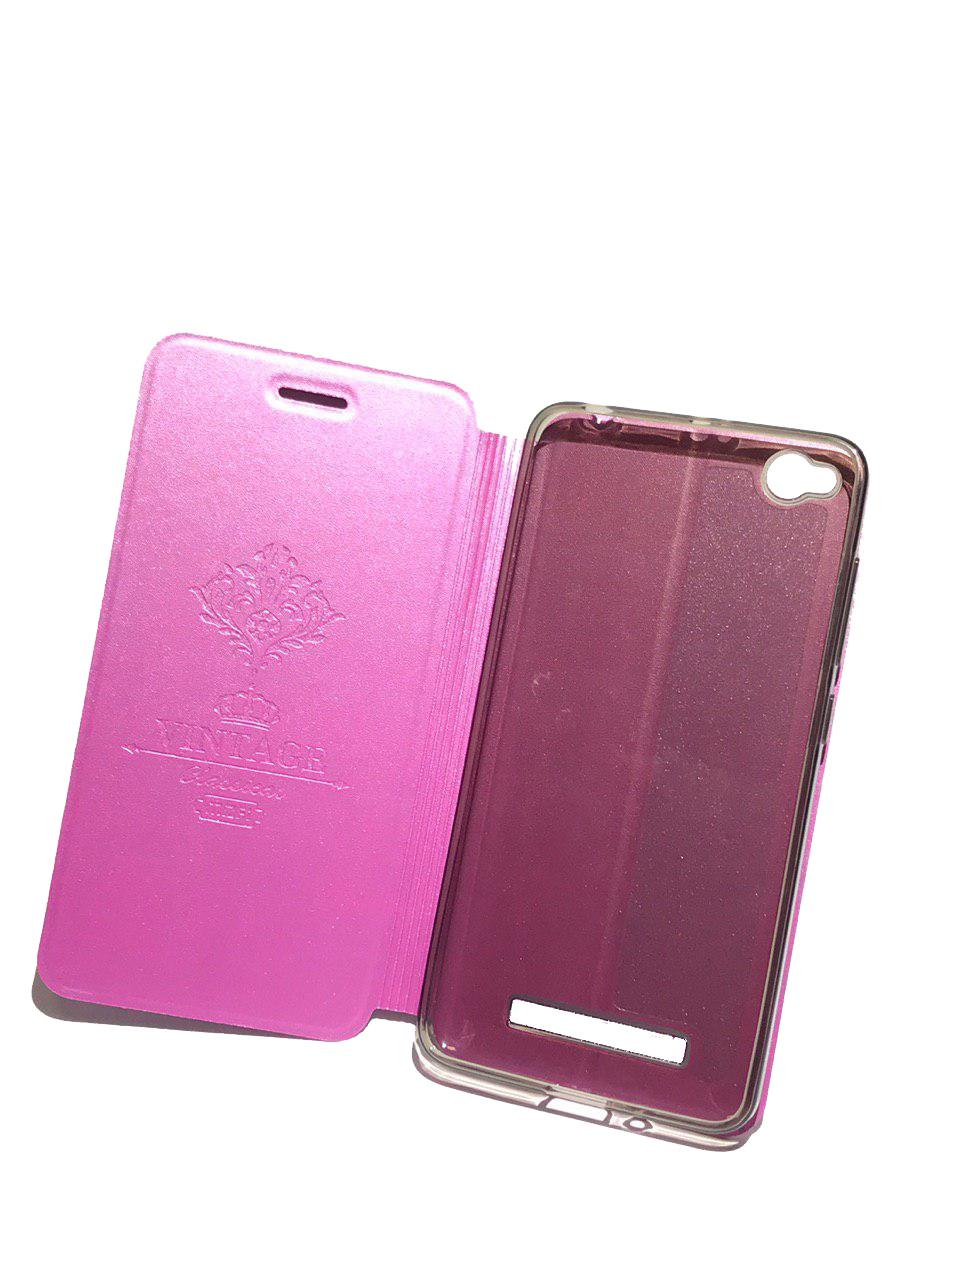 цена на Чехол для Xiaomi Redmi Note 4X Книжка Pearl Xiaomi Redmi Note 4X Pink